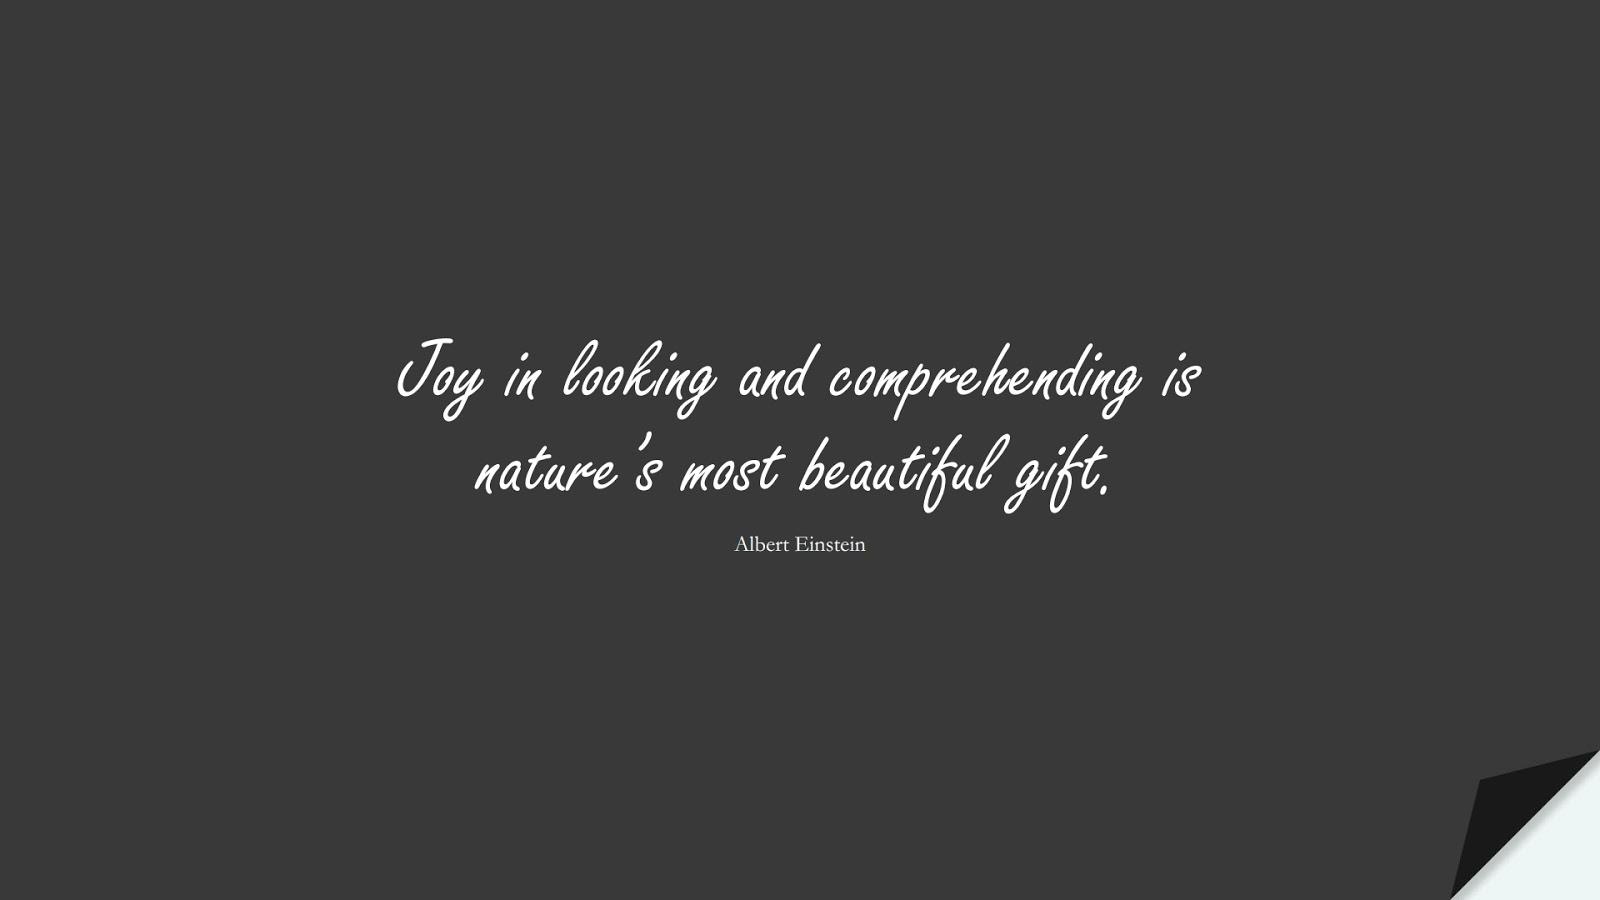 Joy in looking and comprehending is nature's most beautiful gift. (Albert Einstein);  #AlbertEnsteinQuotes